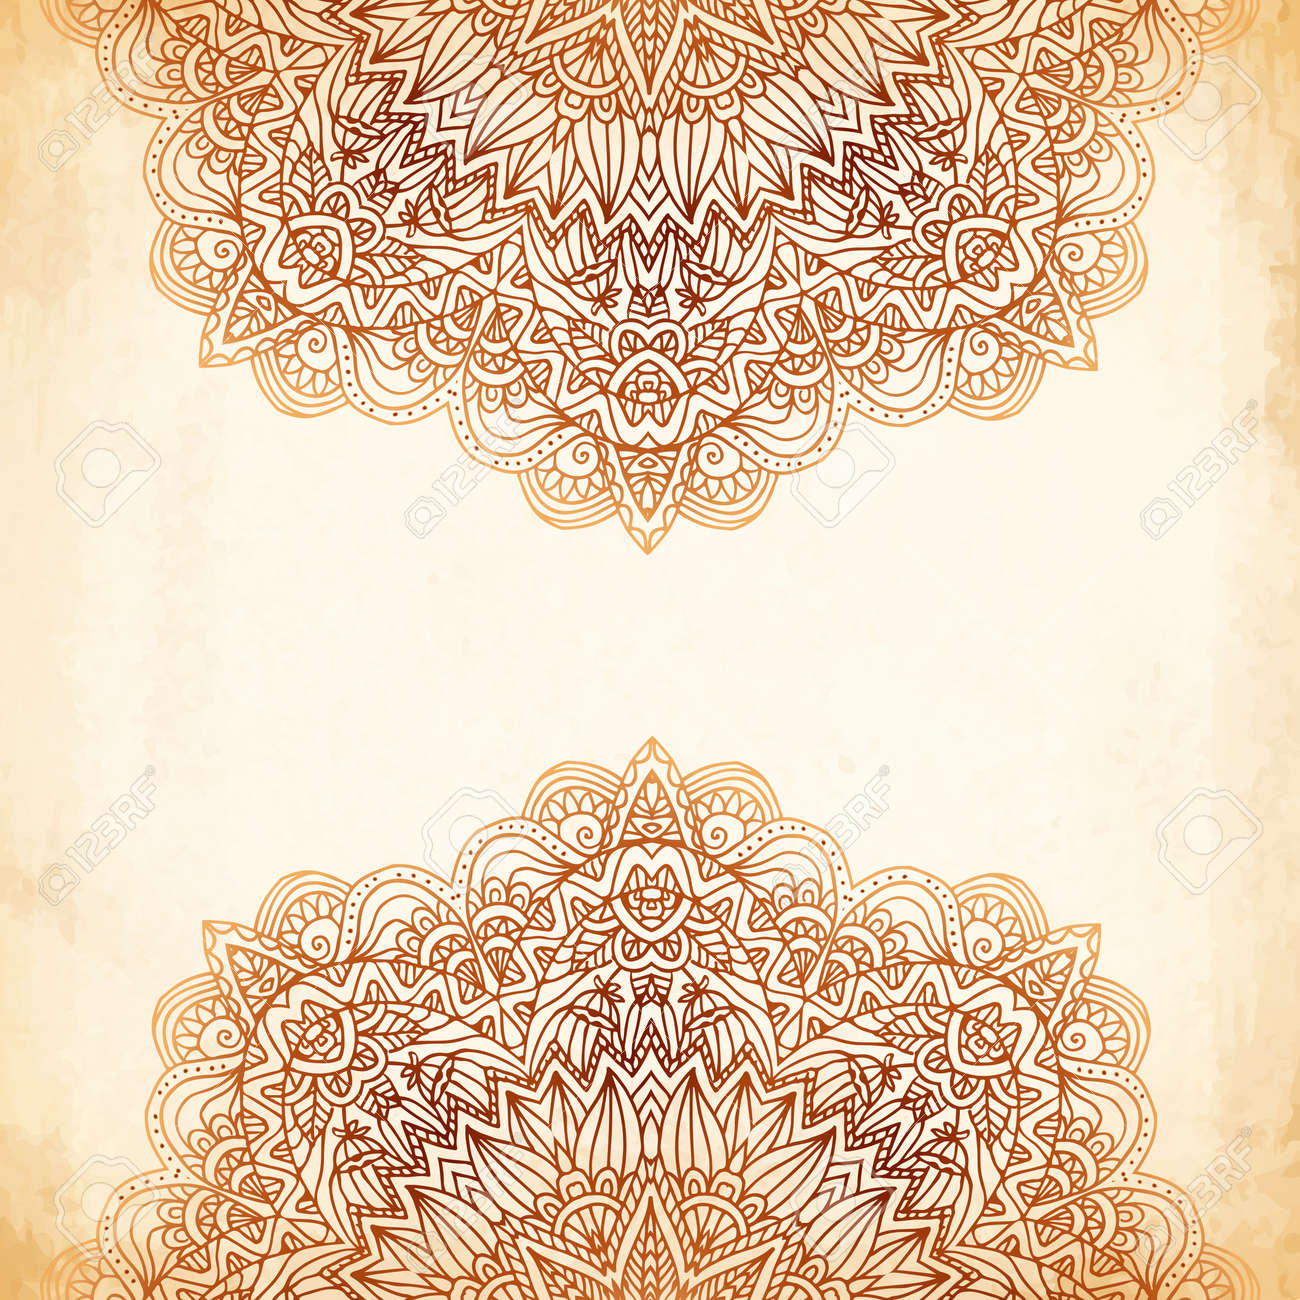 Ornate vintage vector background in mehndi style royalty free stock - Ornate Vintage Beige Vector Background In Mehndi Style Stock Vector 20914523